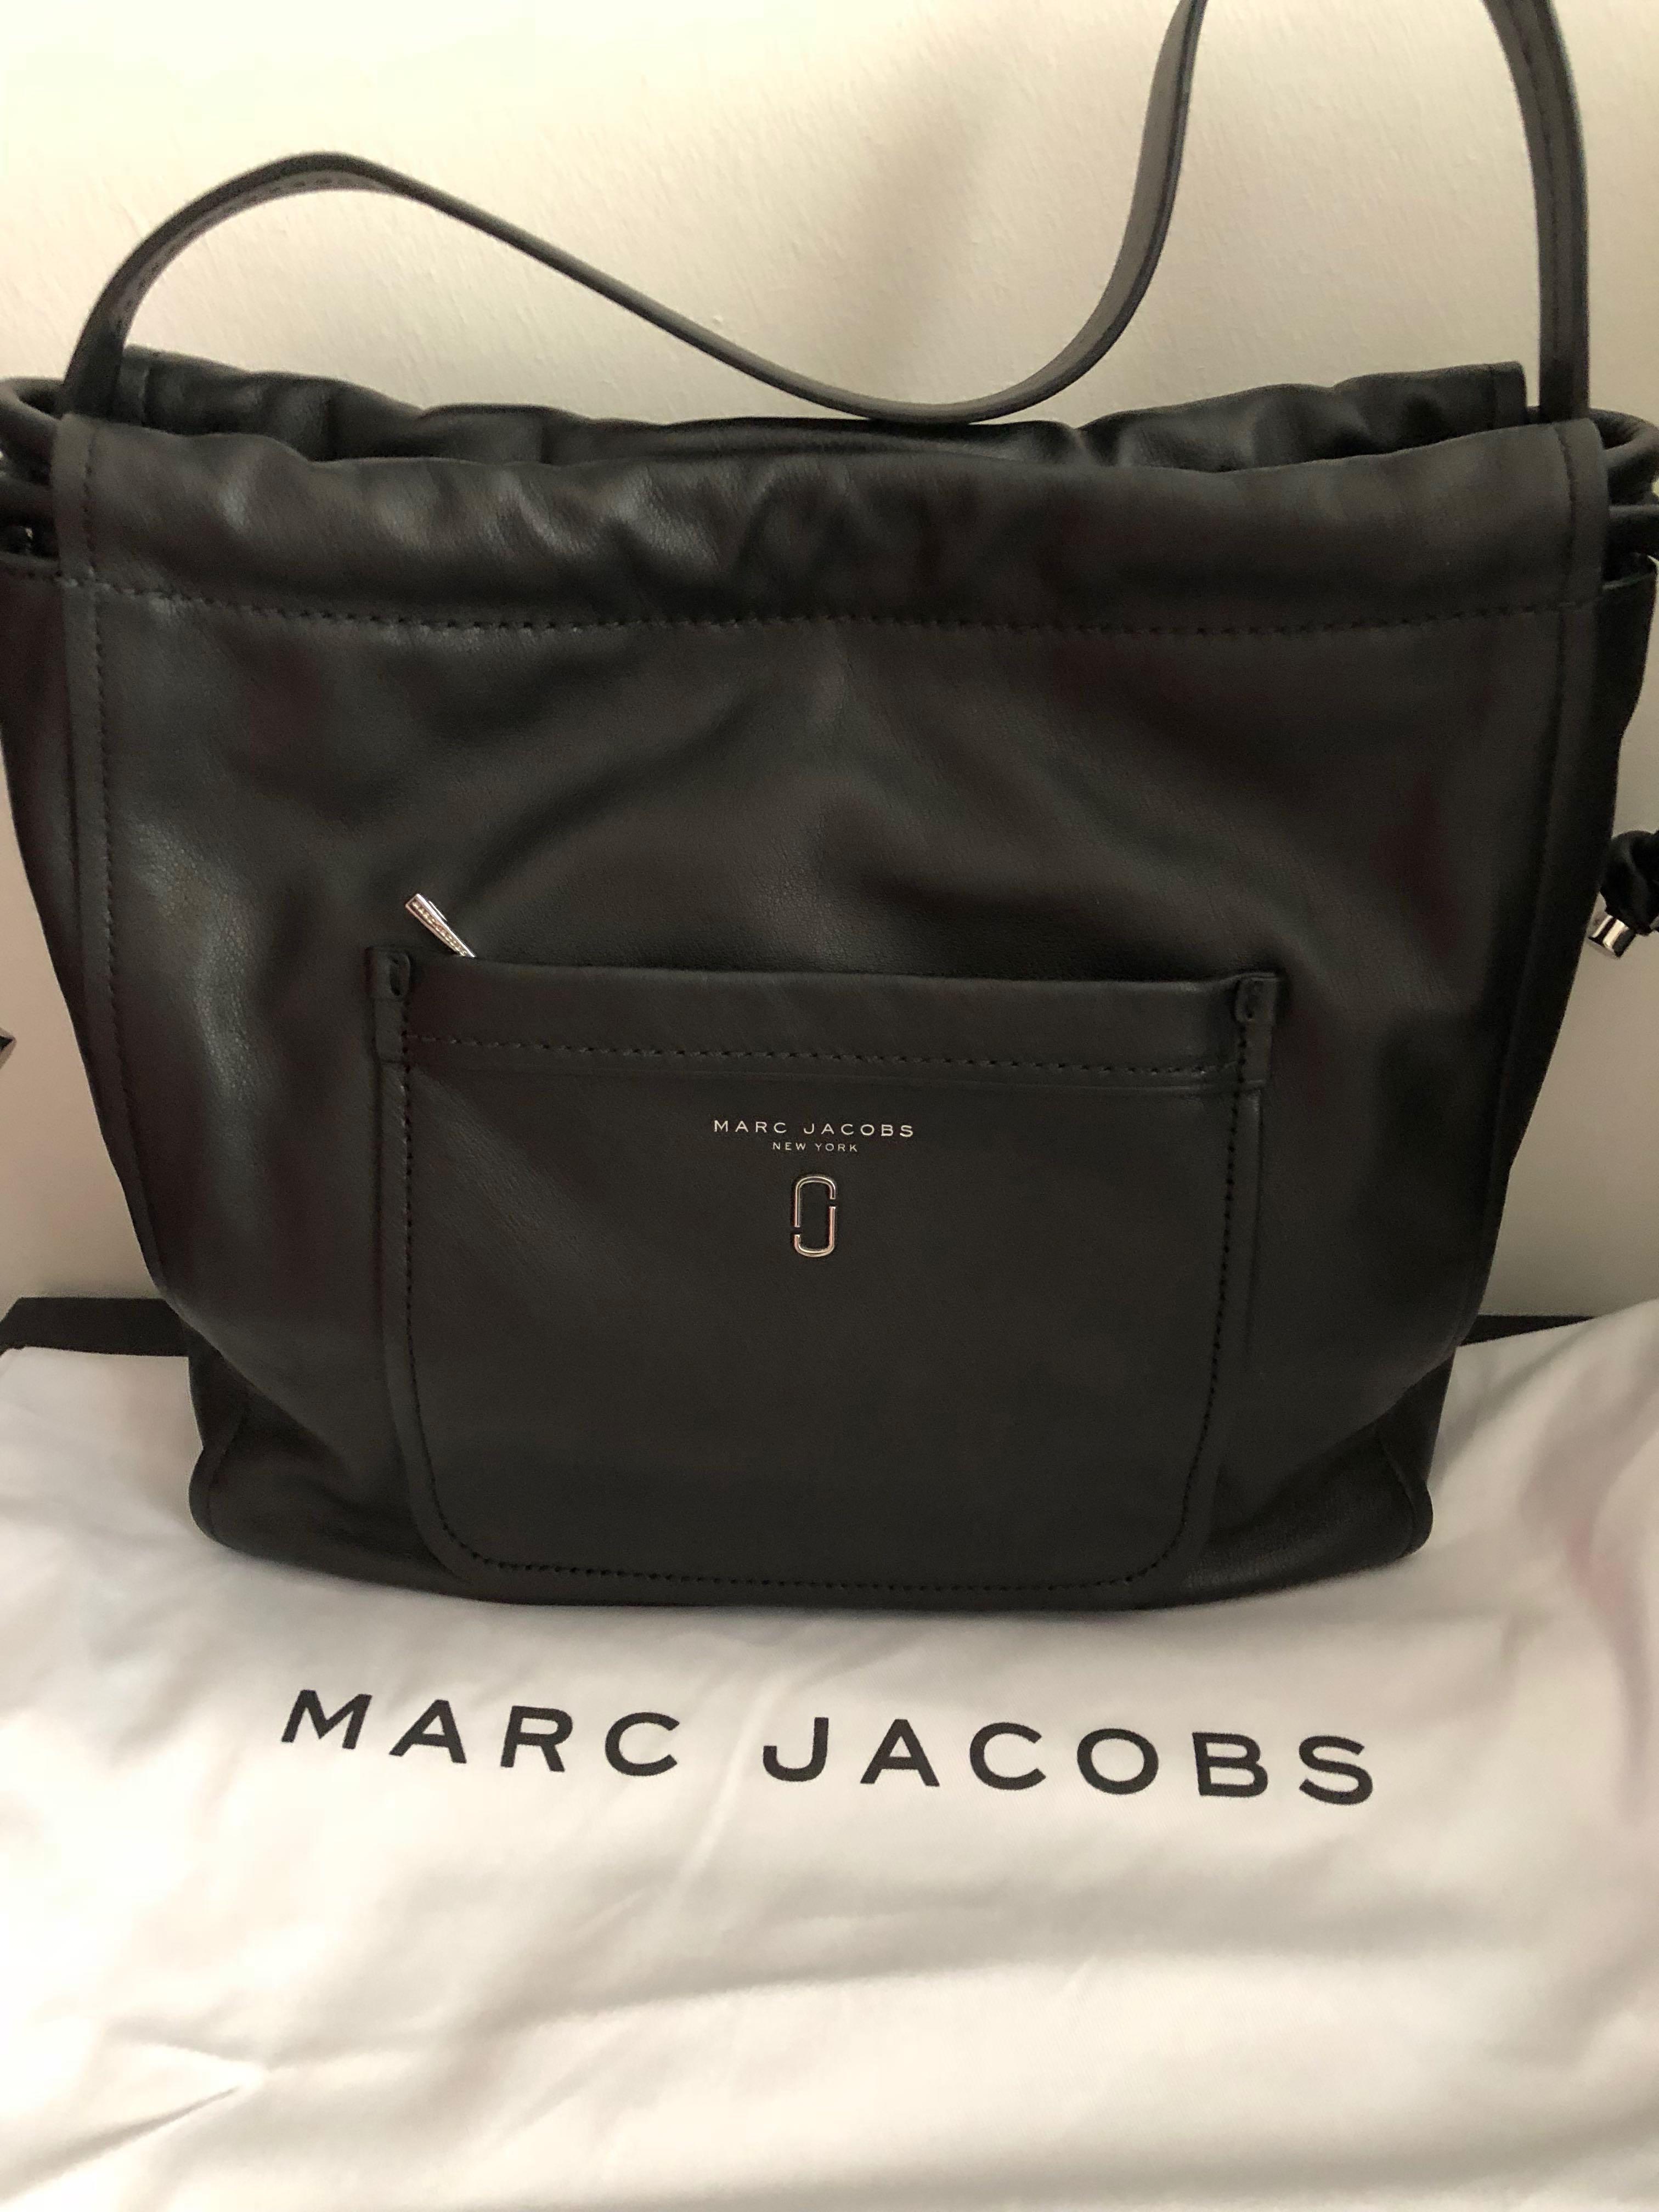 Marc Jacobs Handbag (100%Authentic) 5371973b49e38